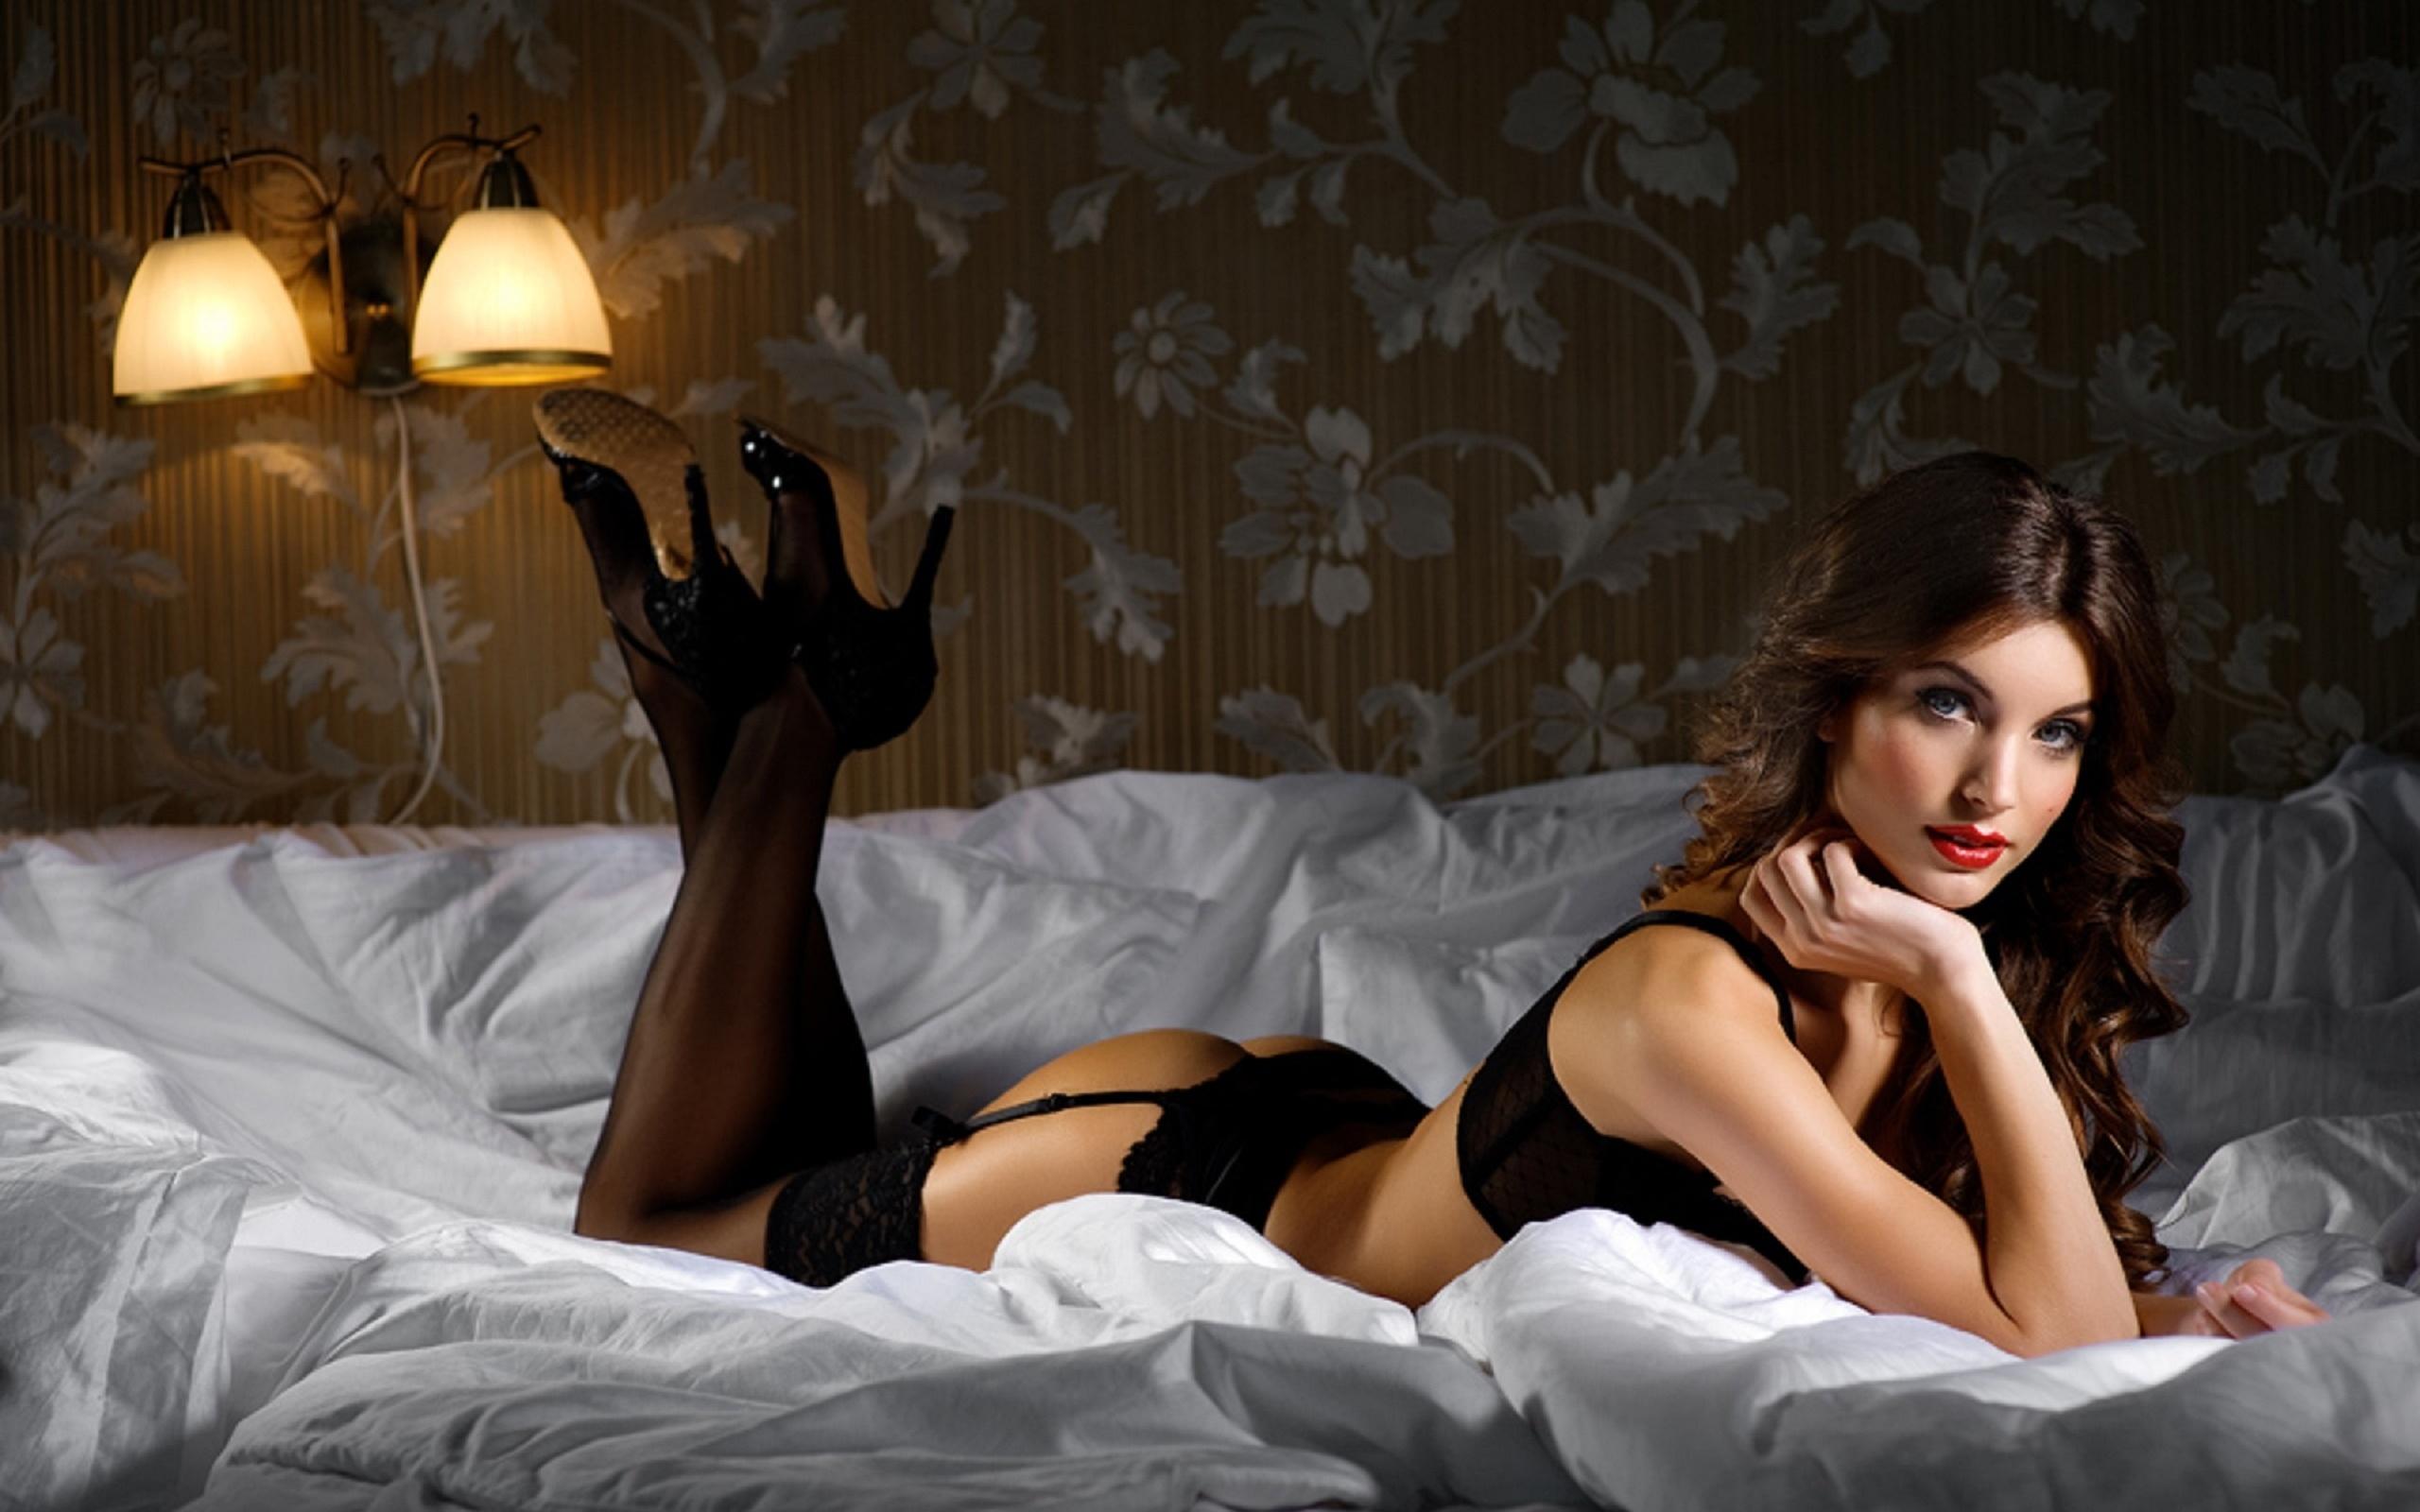 zhenshini-obolstitelnitsi-video-seks-muzha-s-blizkoy-podrugoy